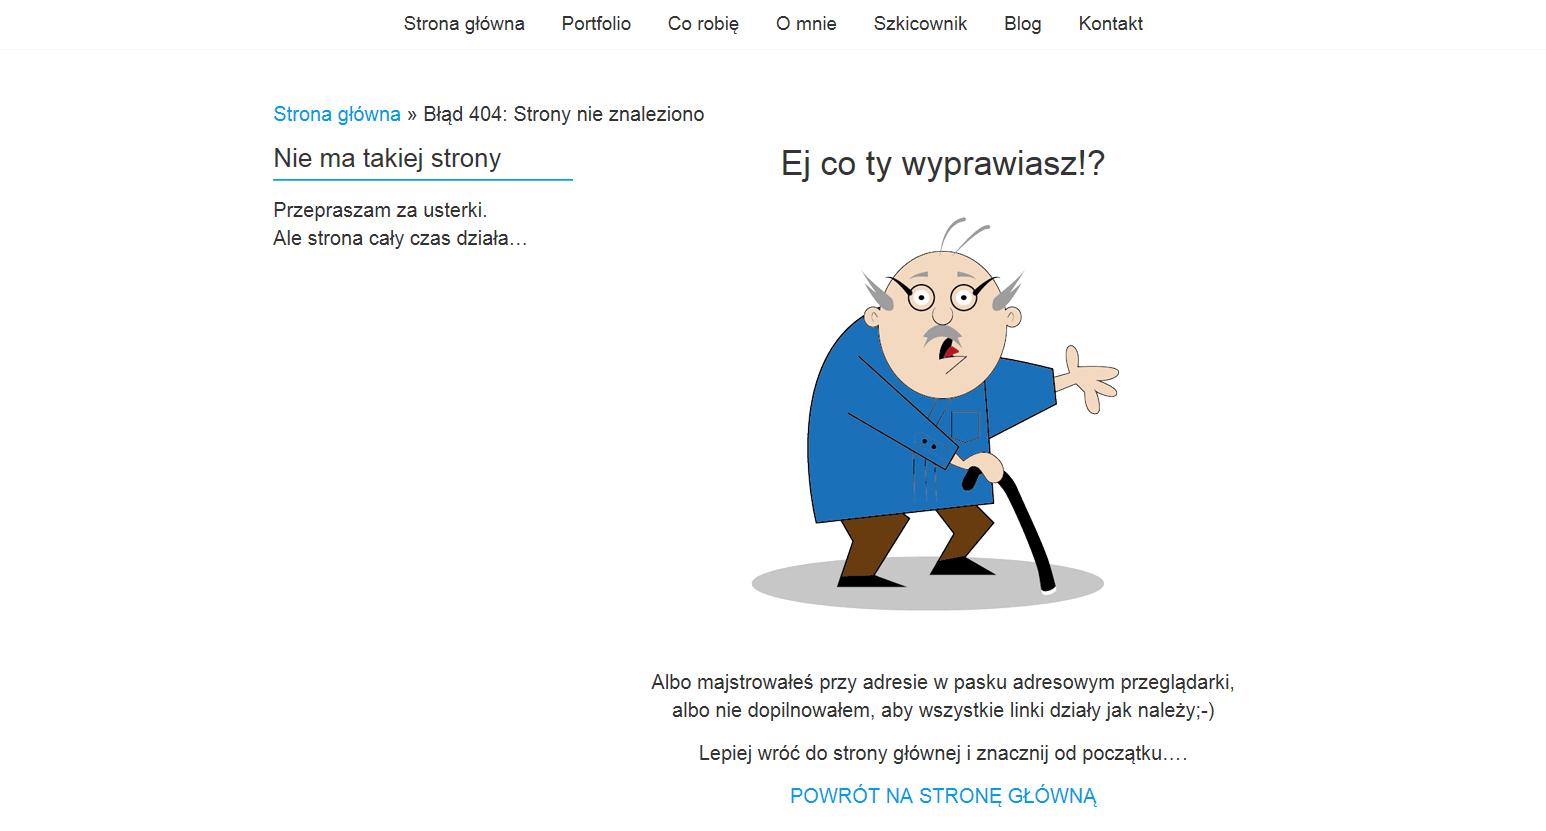 Strona błędu 404